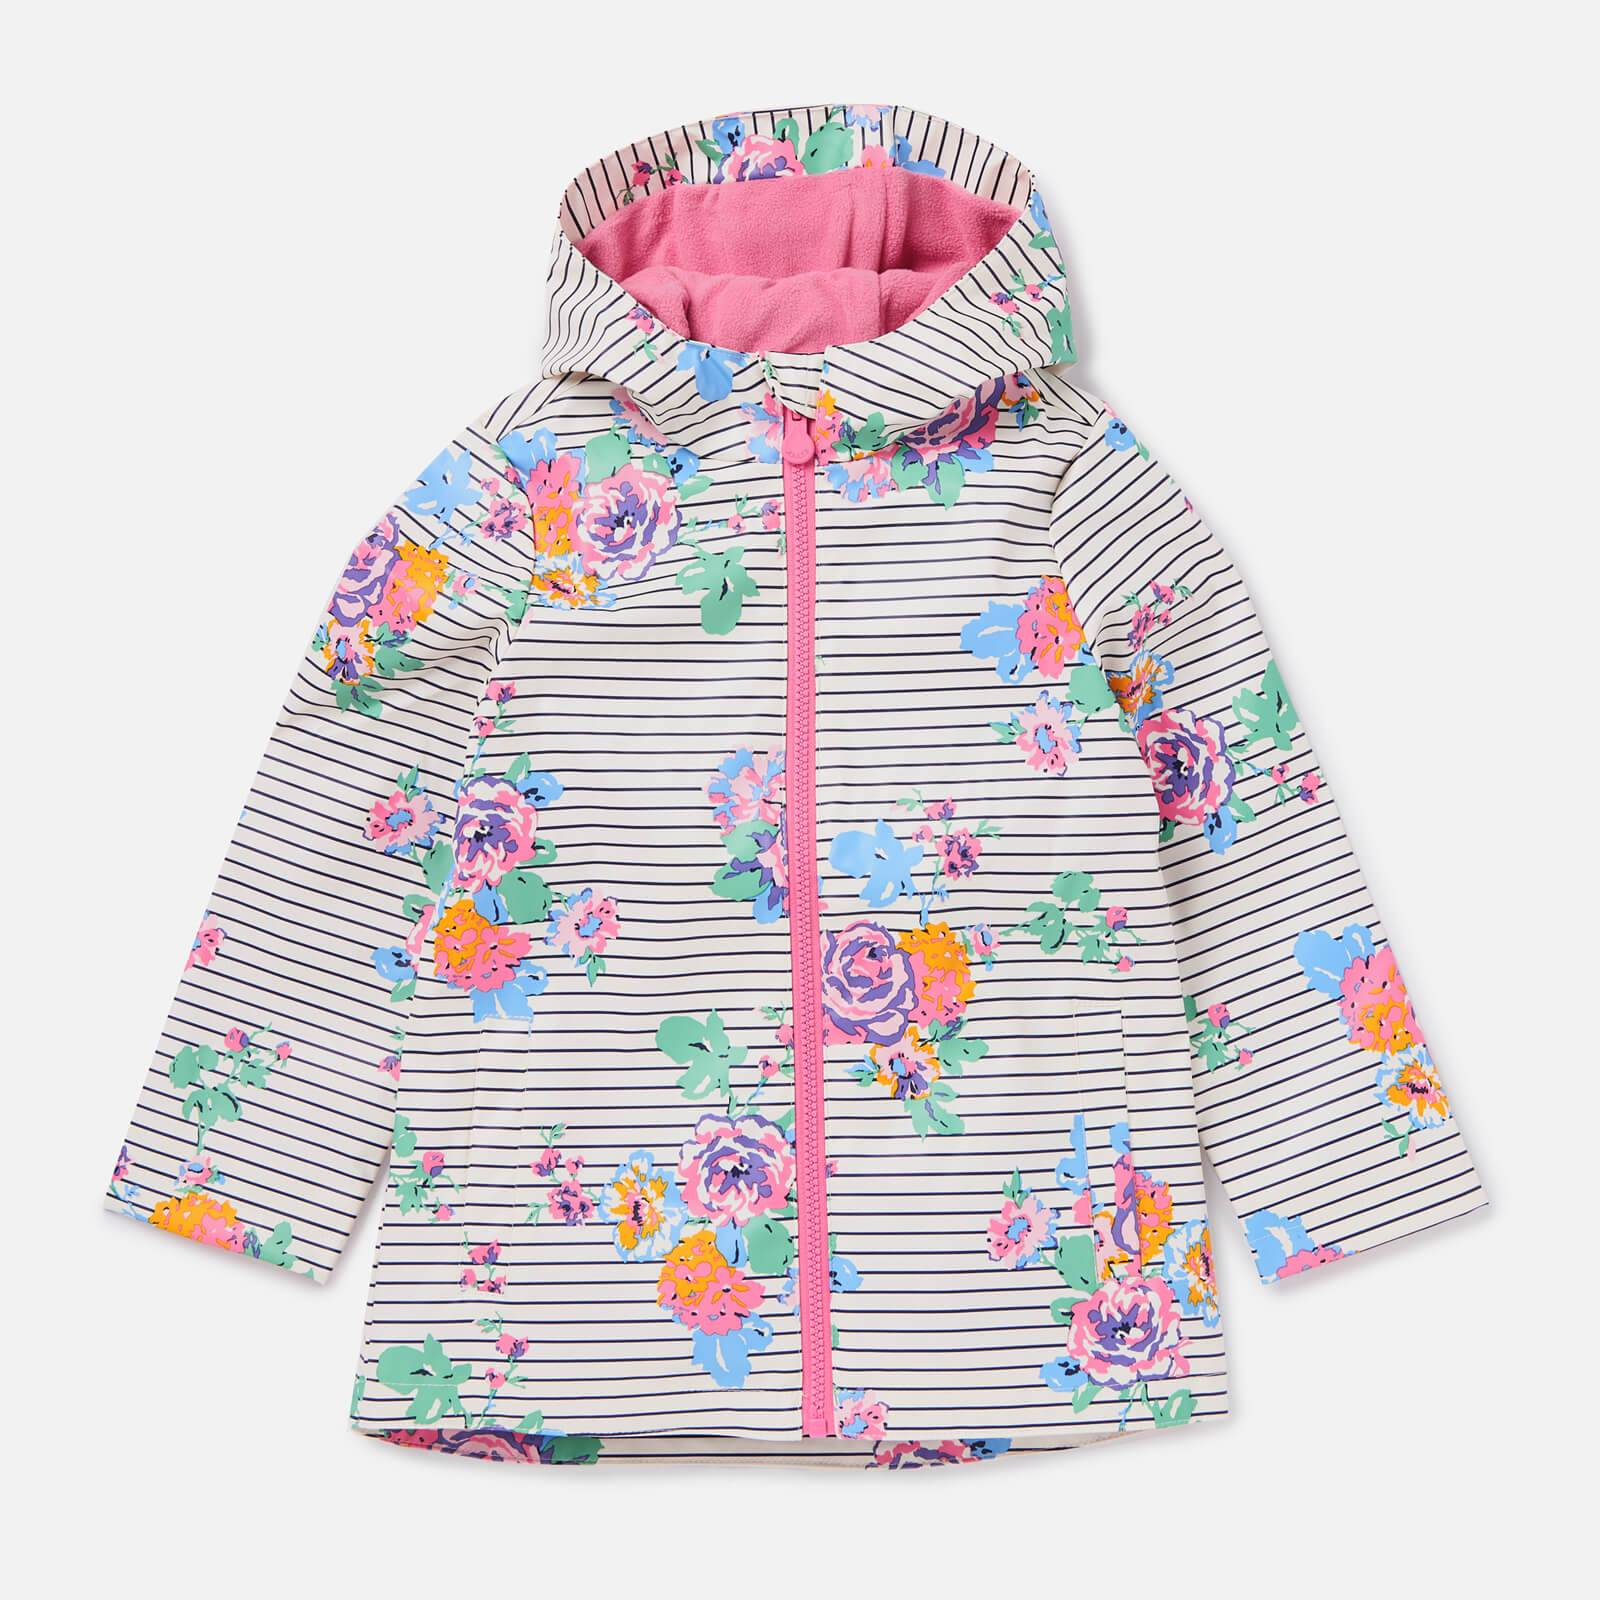 Joules Girls' Raindance Showerproof Rubber Coat - Cream Navy Floral - 2 Years